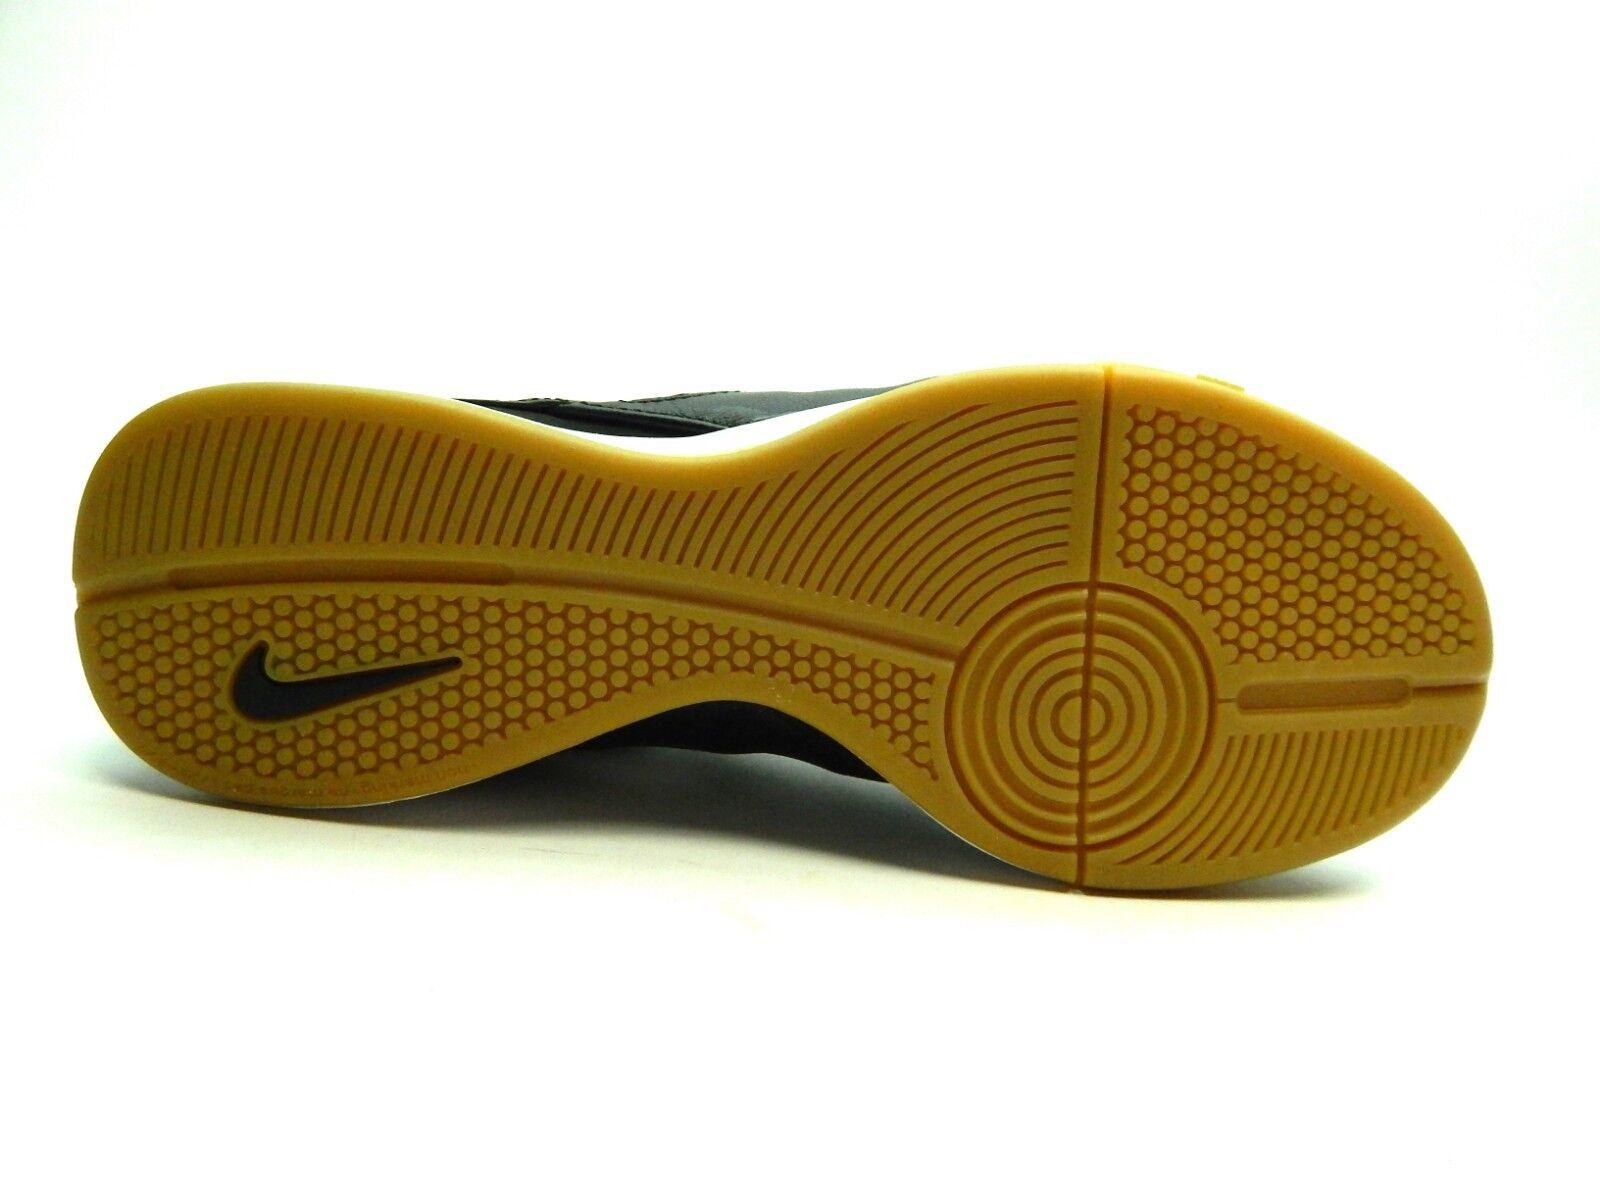 Men's*Adidas*WhiteBlack*Shoe*Superstar II*G17068*Sz.10.5*US 10 UK*Shell Toe*EUC